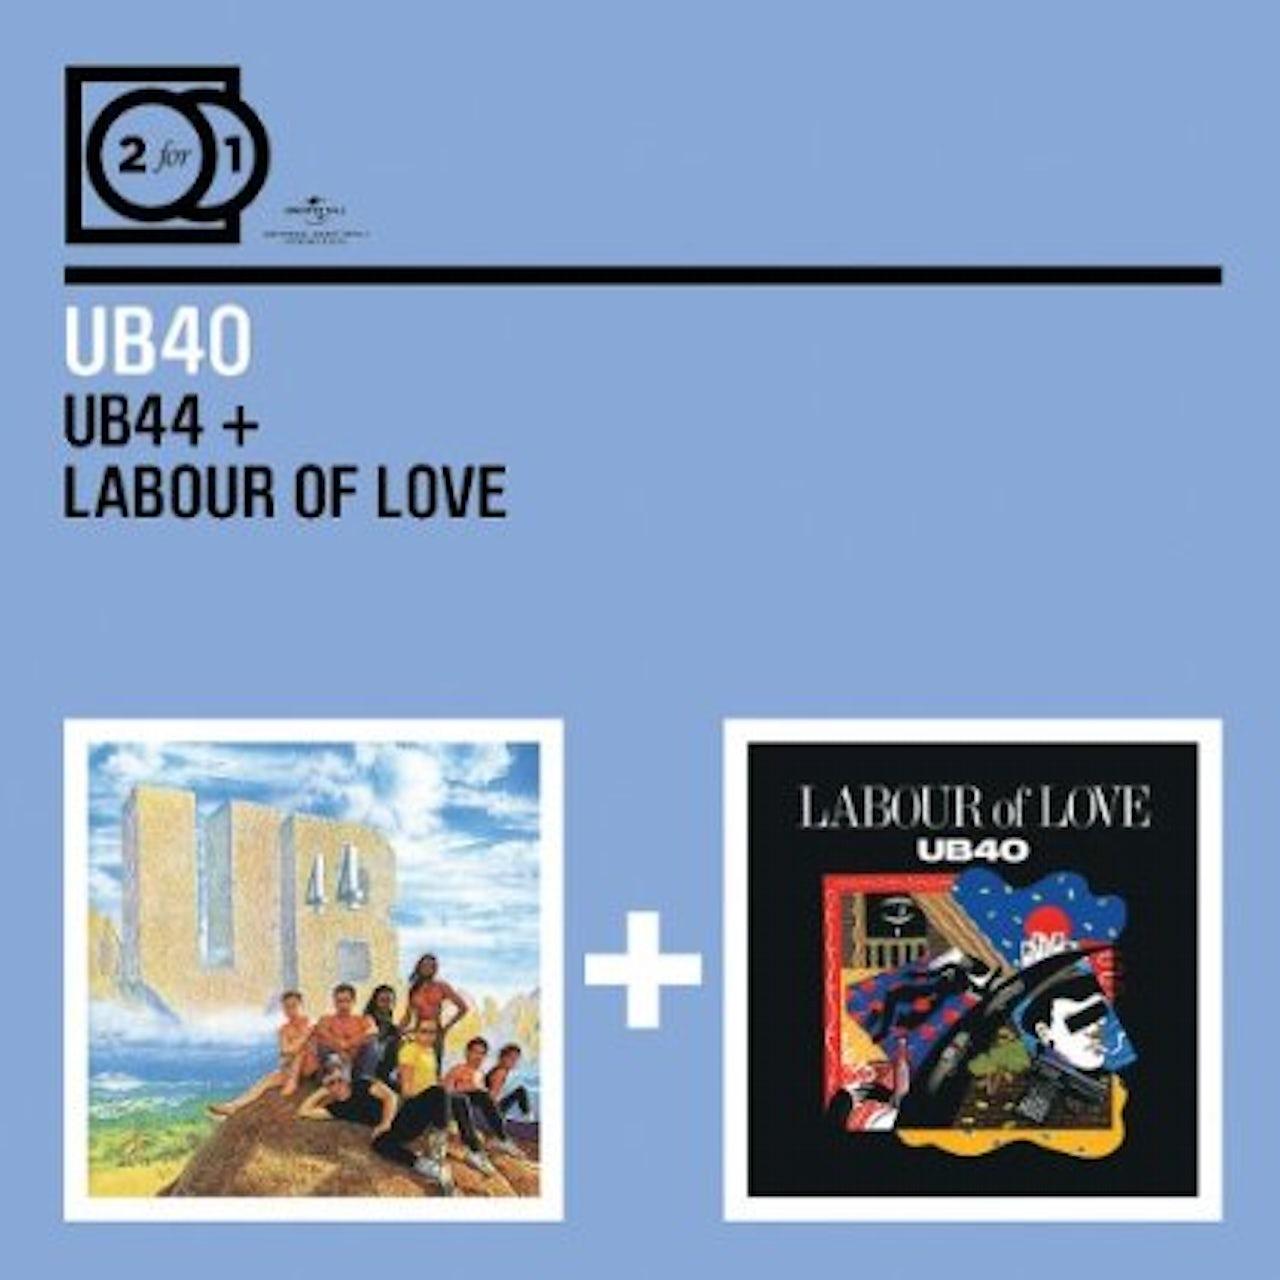 Ub40 UB44 / LABOUR OF LOVE CD